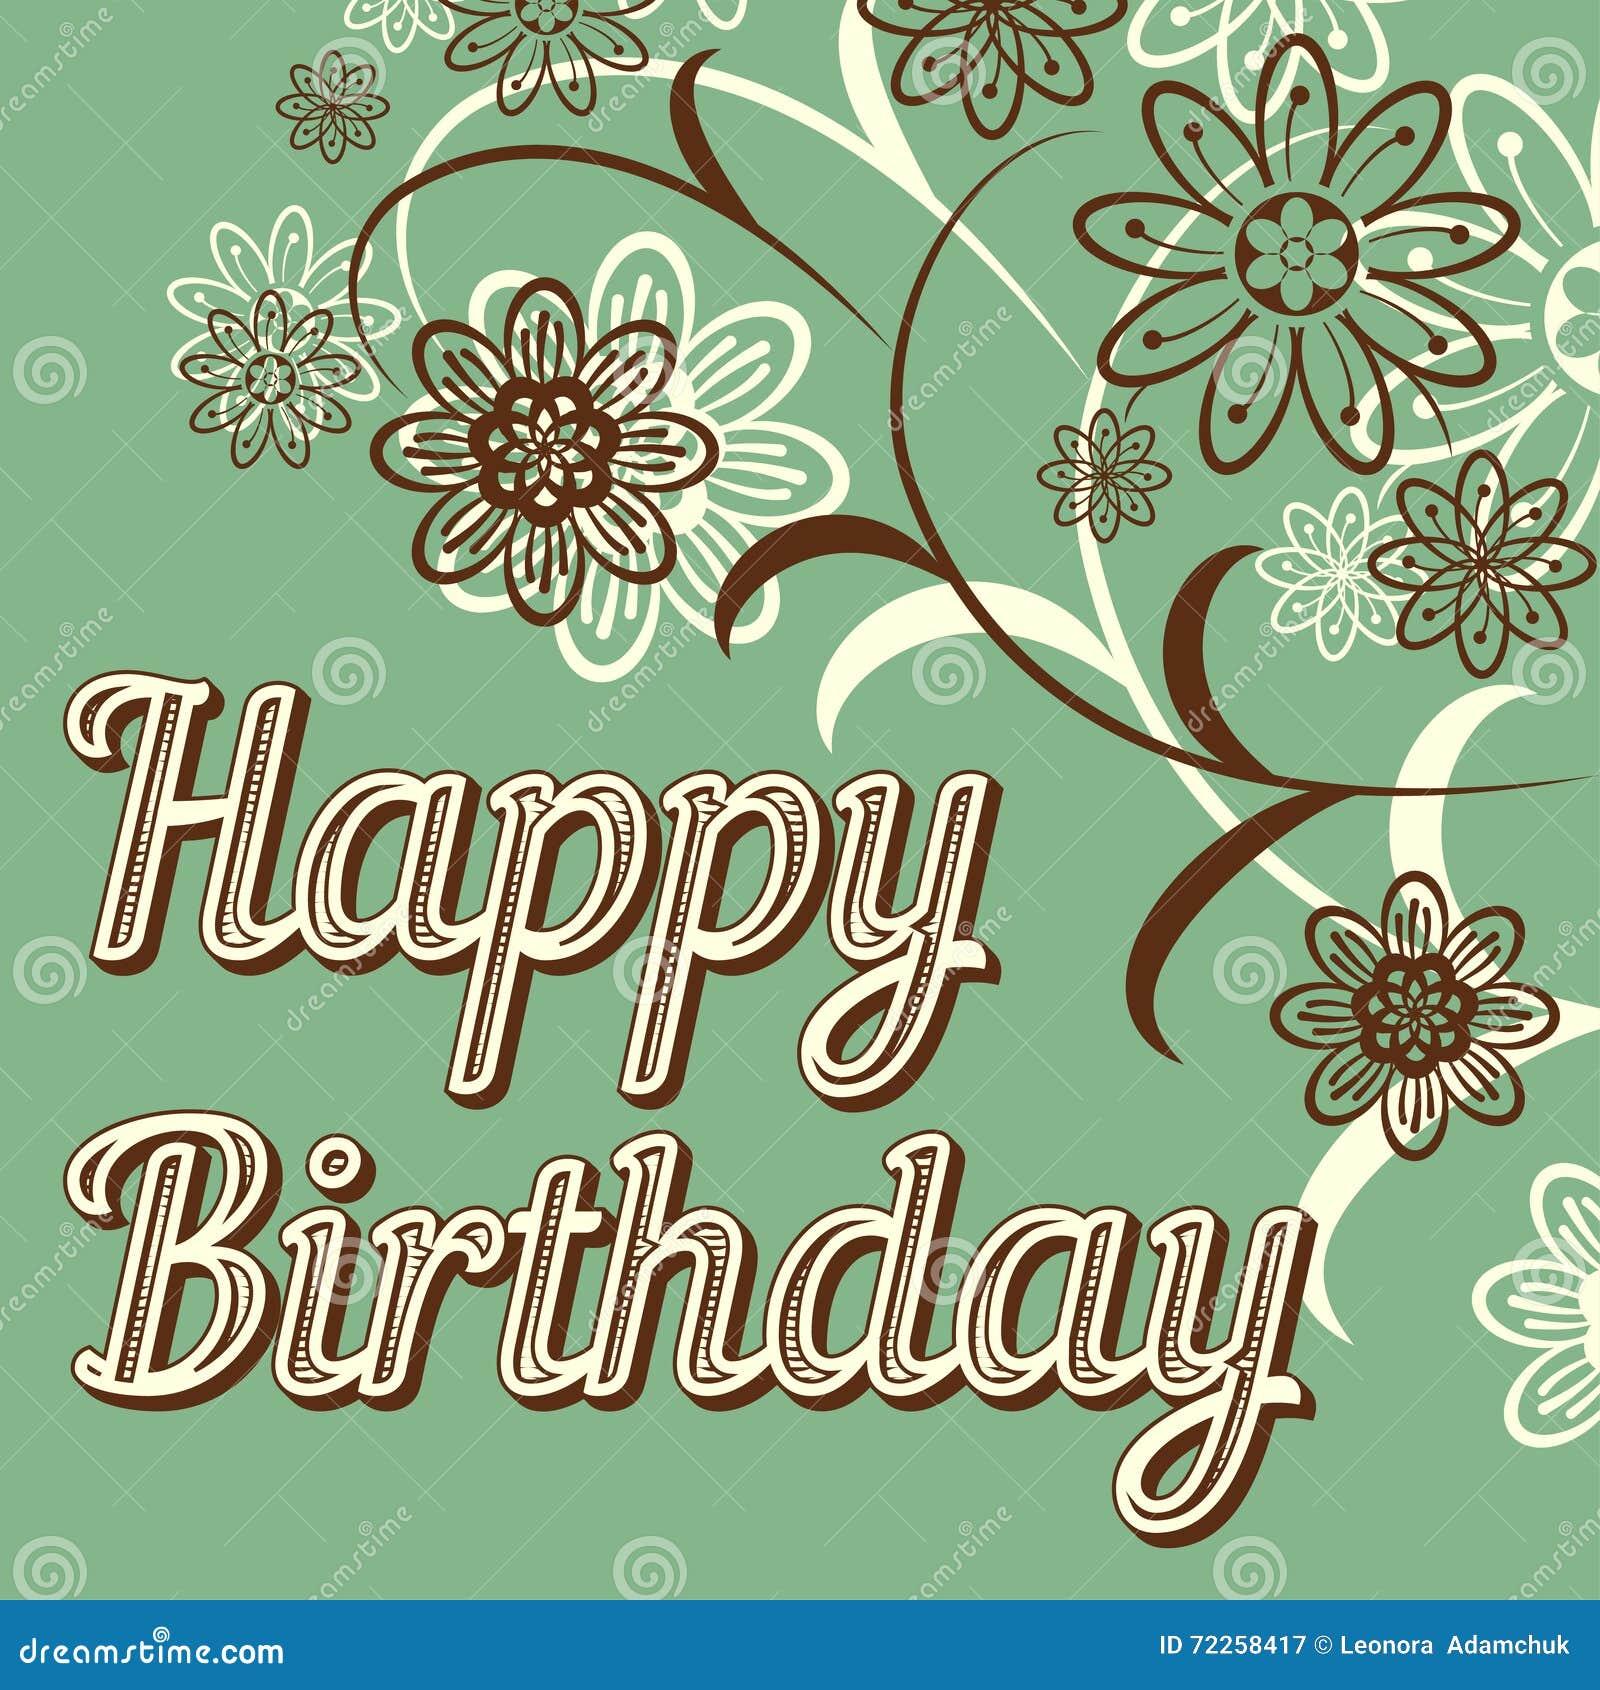 vintage retro happy birthday card, with fonts royalty free stock, Birthday card